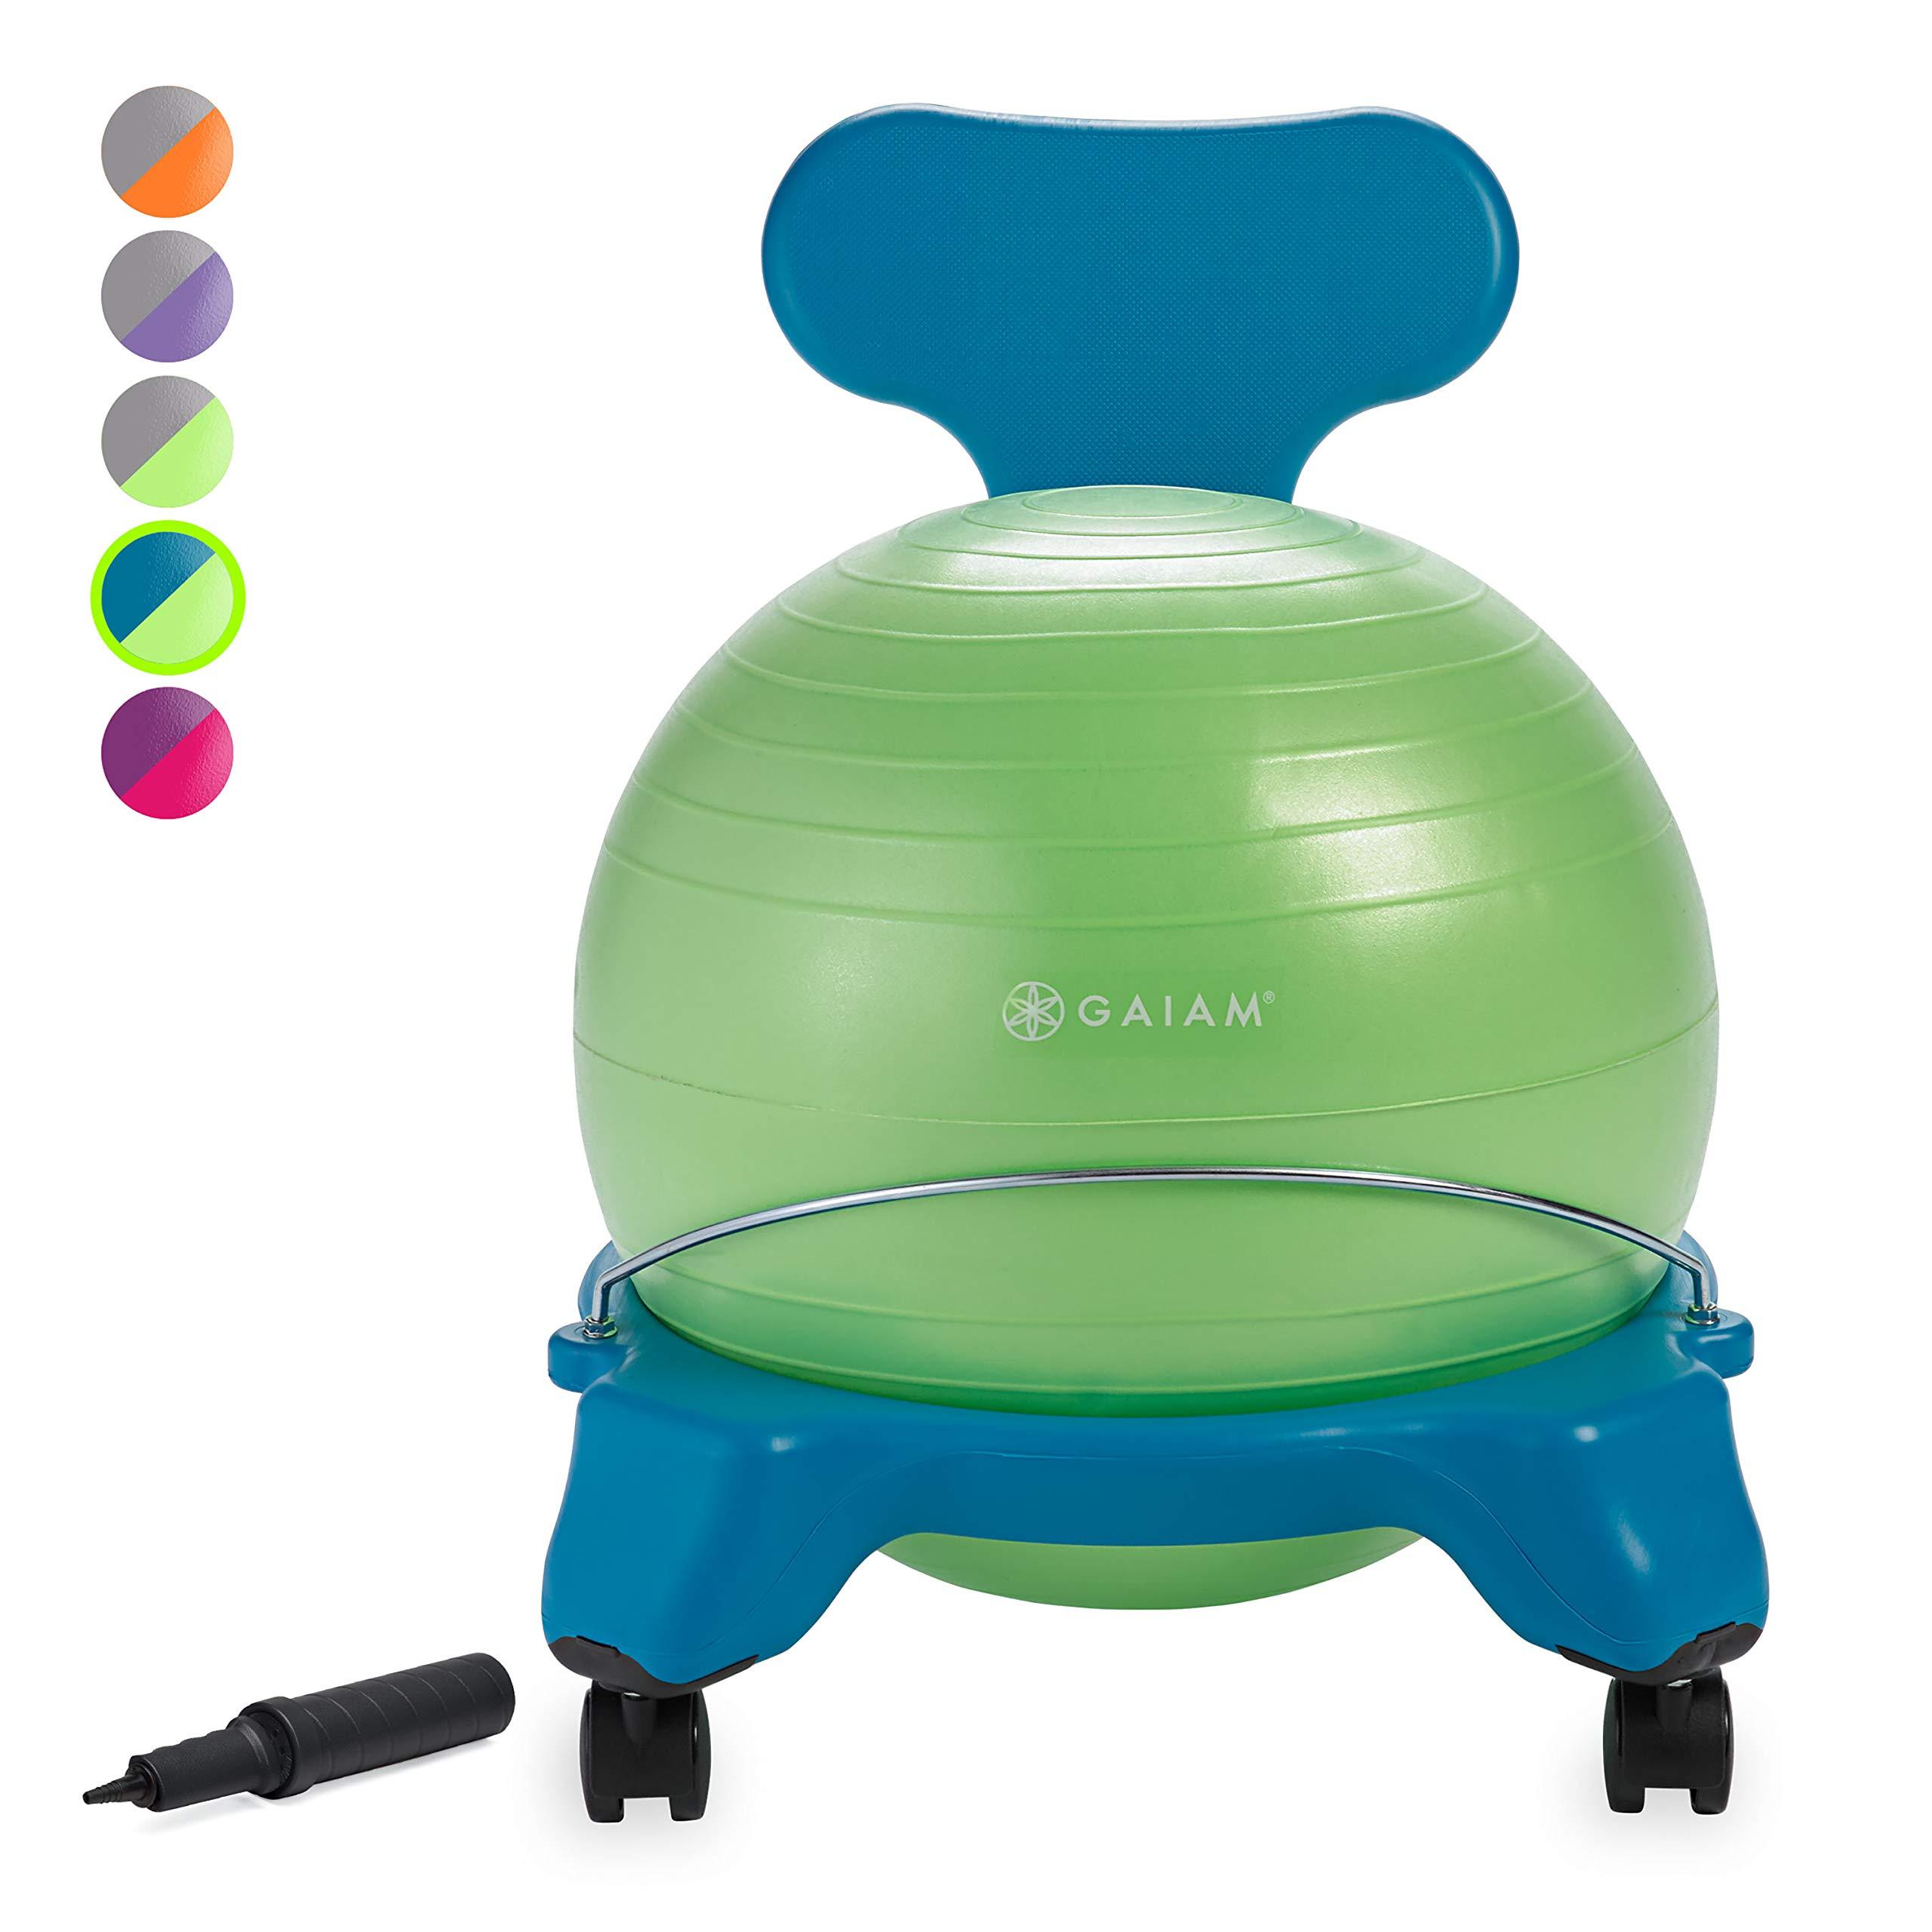 Gaiam Classic Balance Ball Chair Exercise Stability Yoga